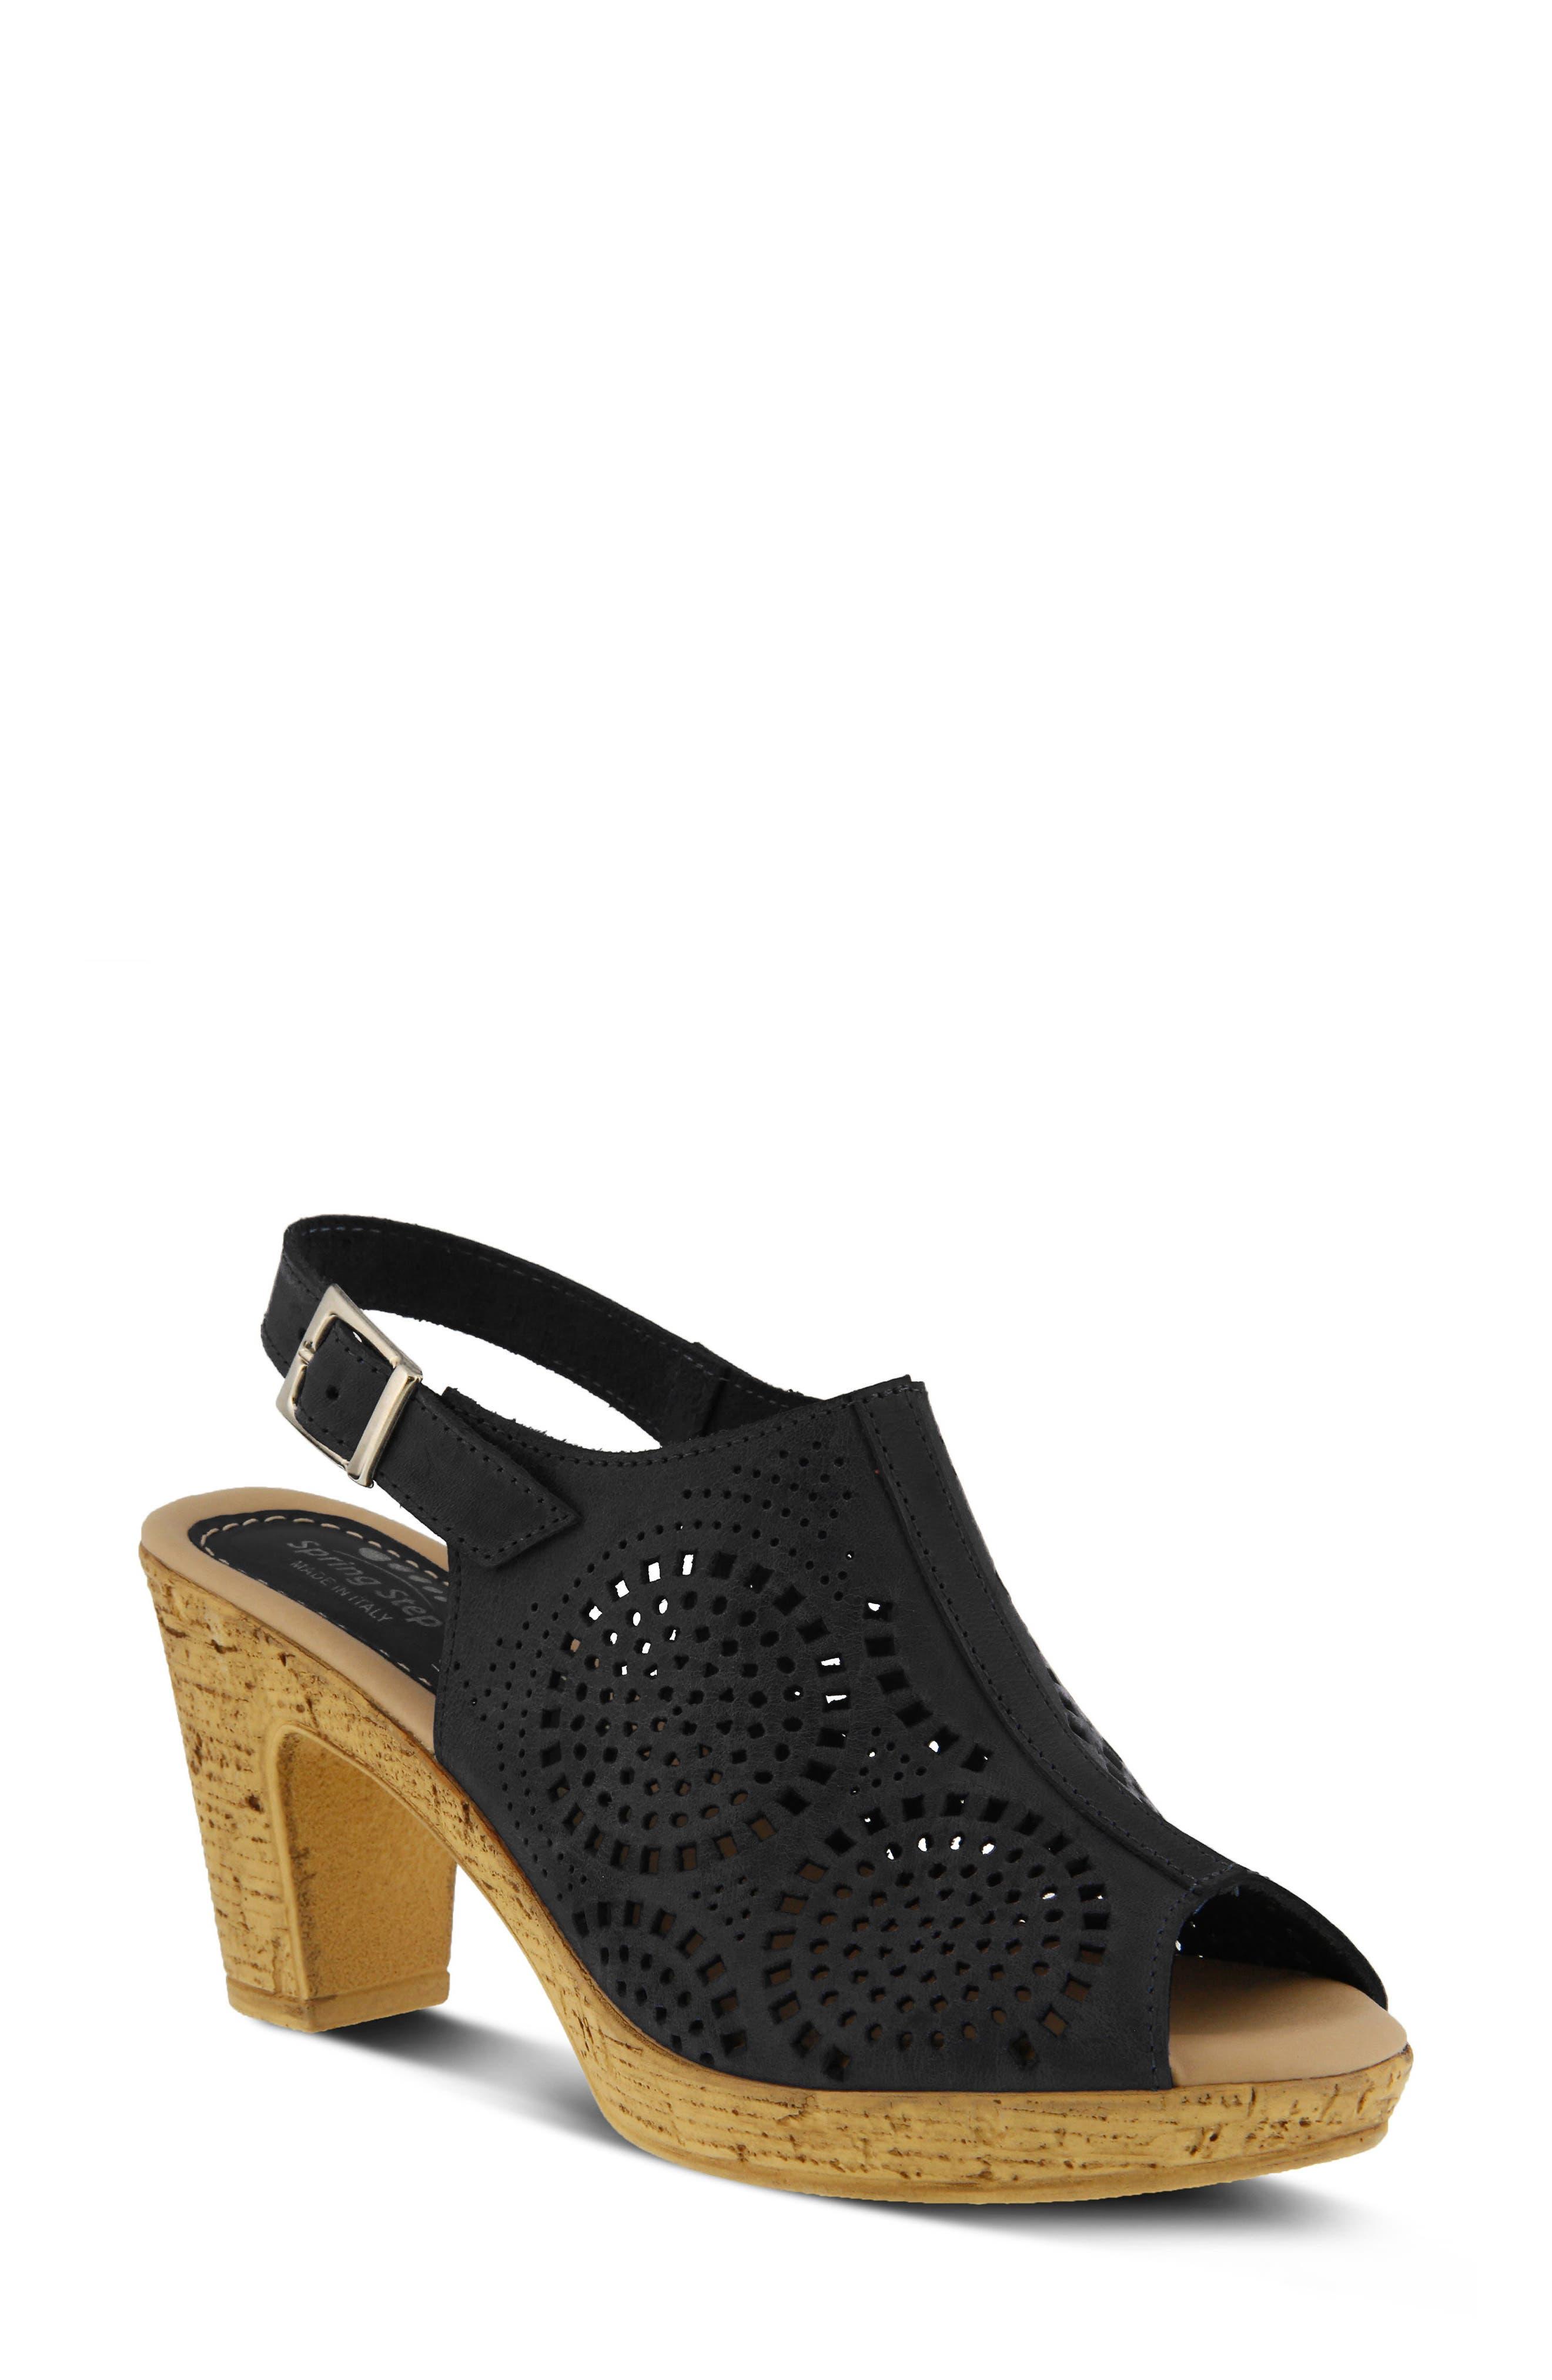 Liberty Platform Sandal,                             Main thumbnail 1, color,                             Black Leather